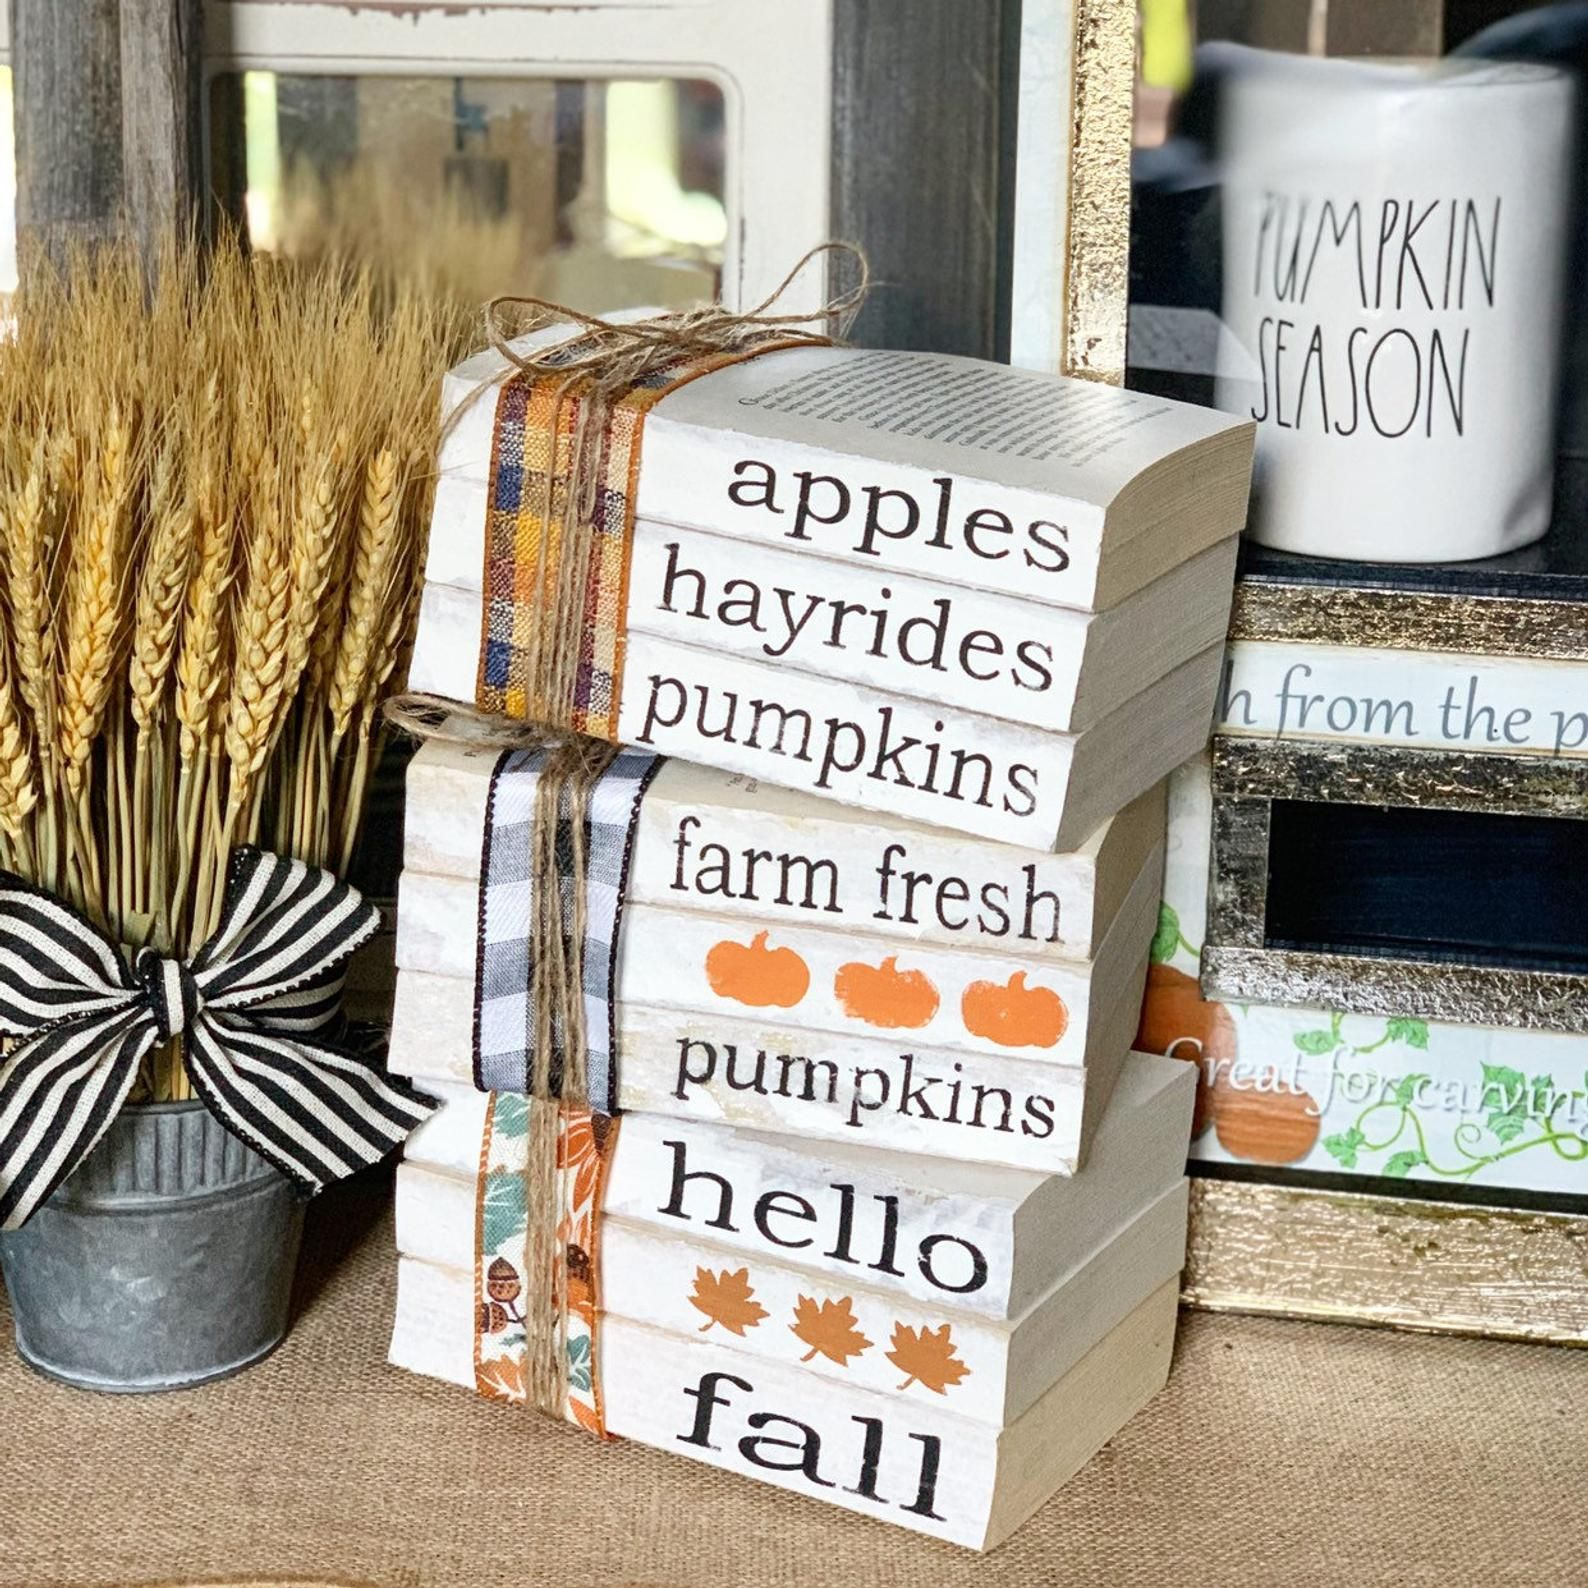 Fall Decor / Stamped Books / Fall decorations / Farmhouse decor / Tiered tray decor / Hello fall / P #falldecor